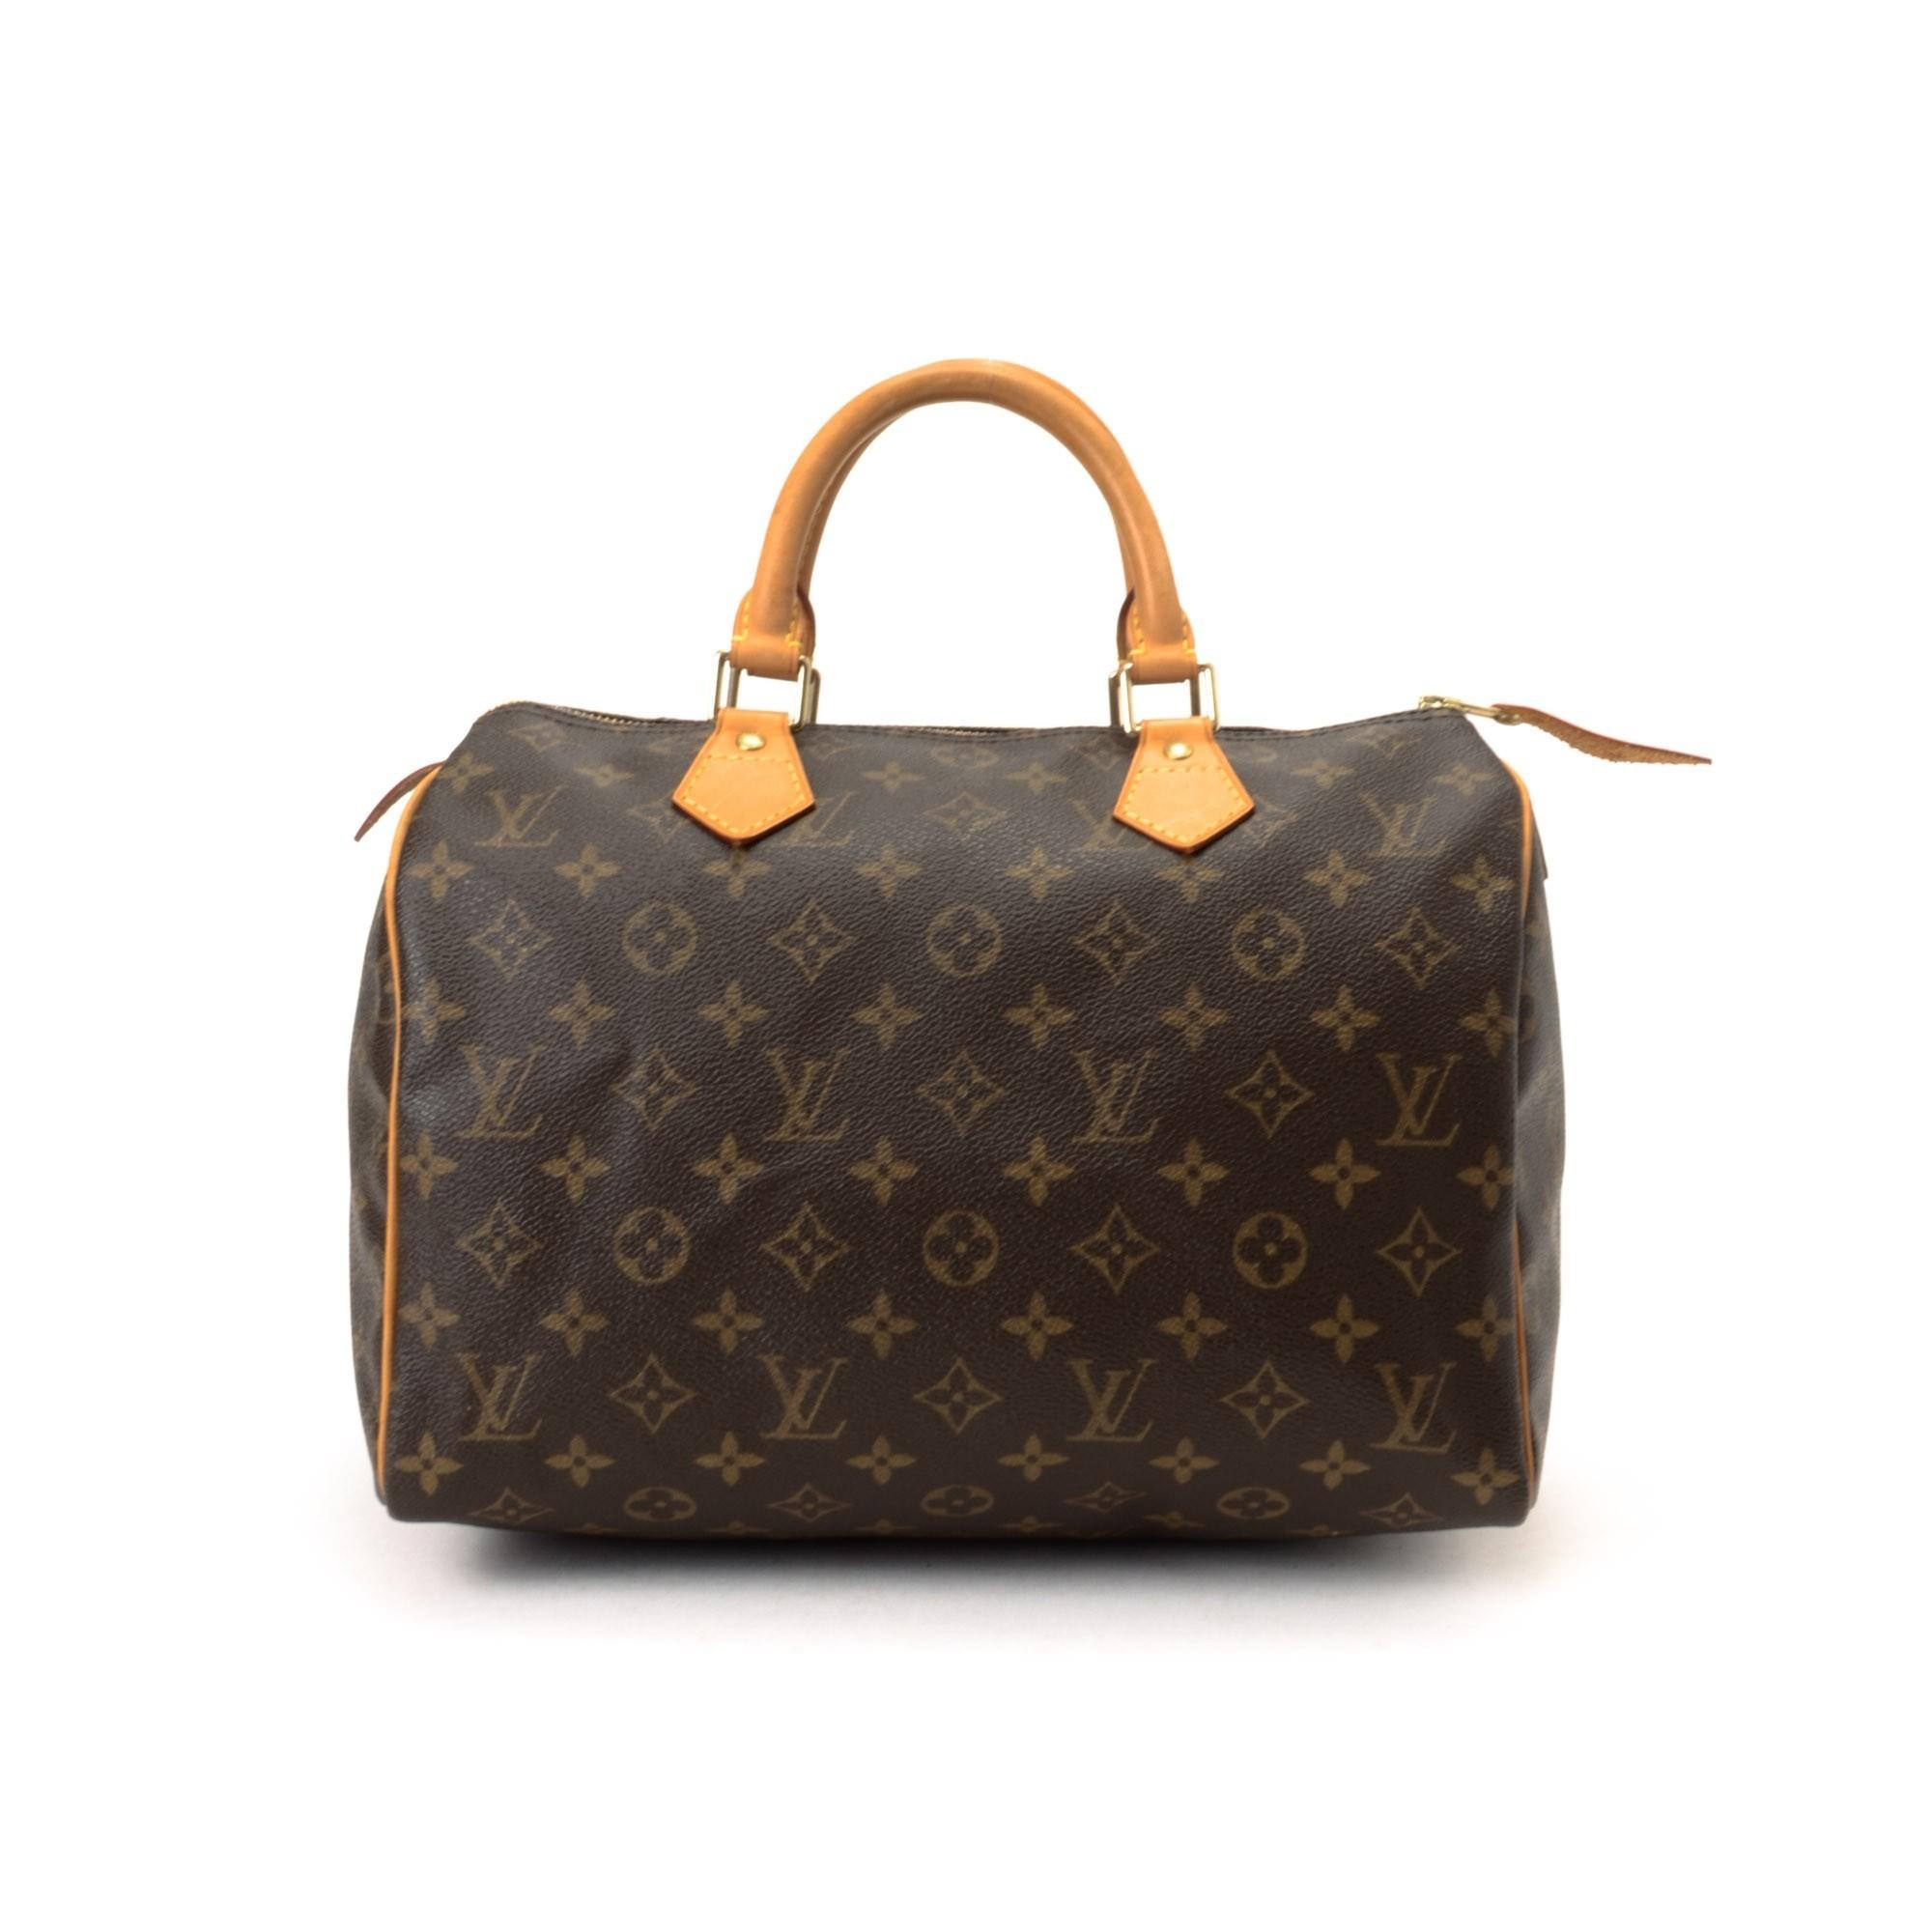 Speedy Louis Vuitton 30